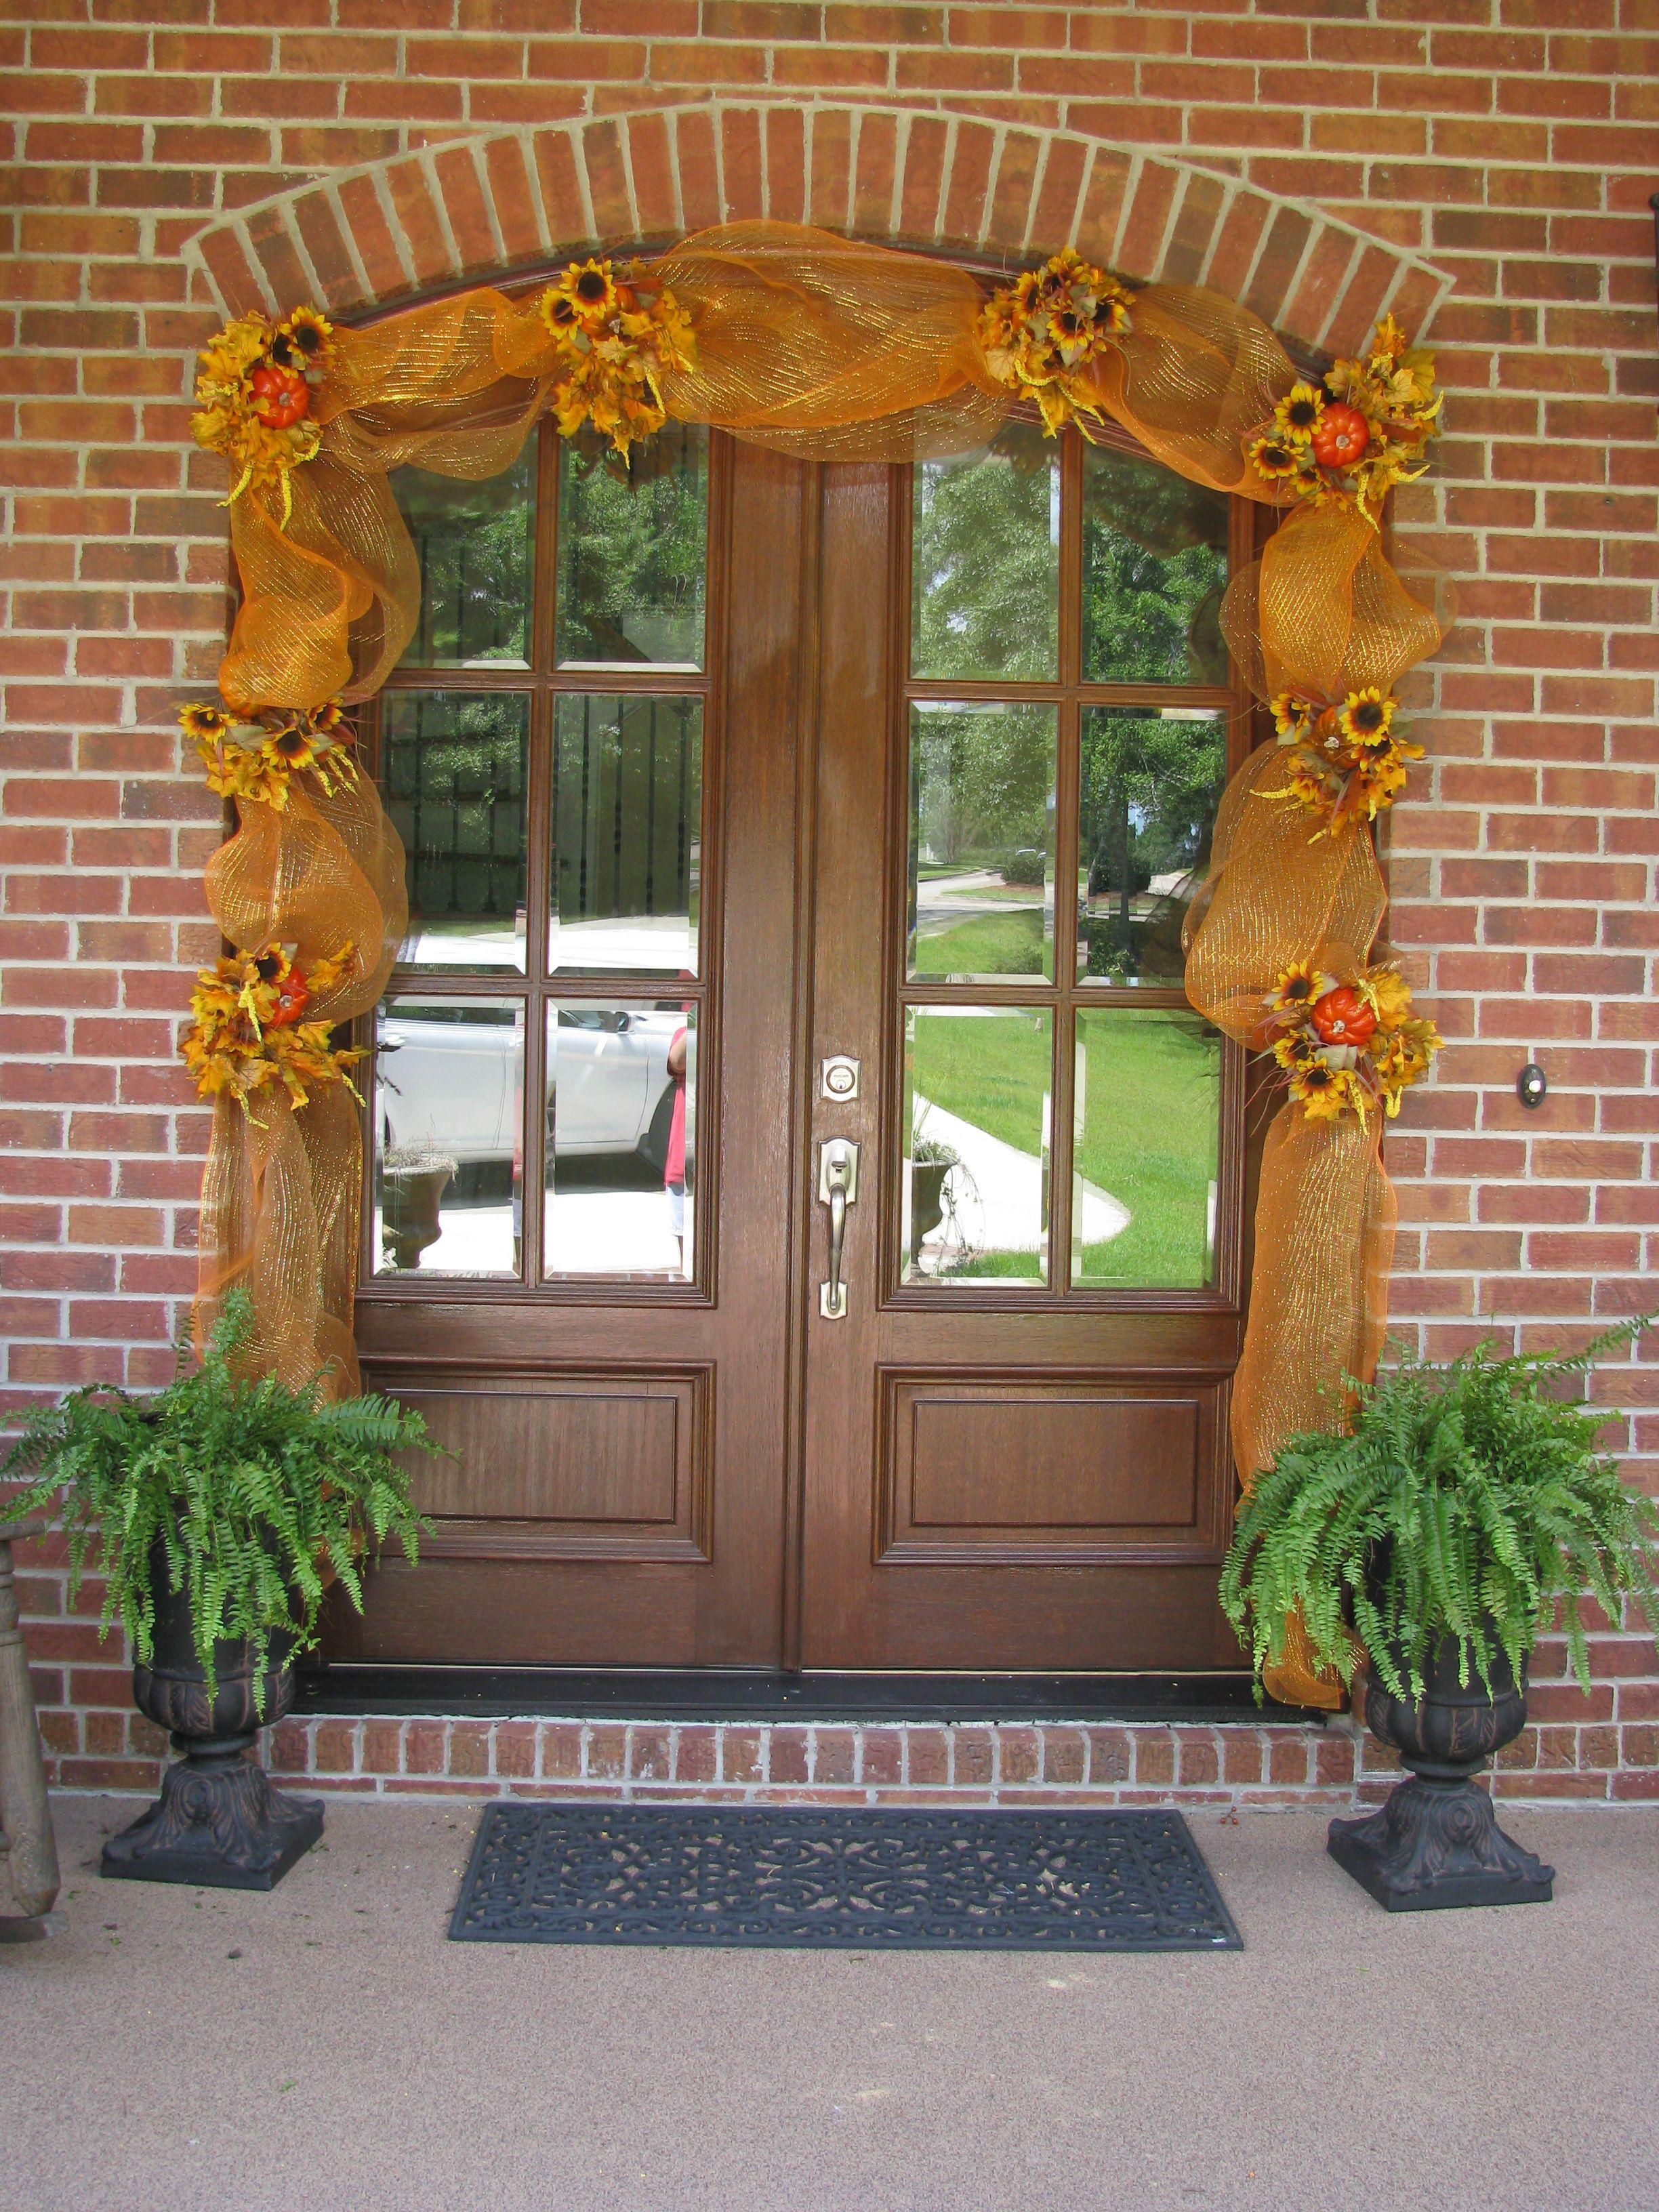 Fall Door Fall Doorholiday Funholiday Decorfall Craftsfront Porcheshappy Fallfall Halloweencurb